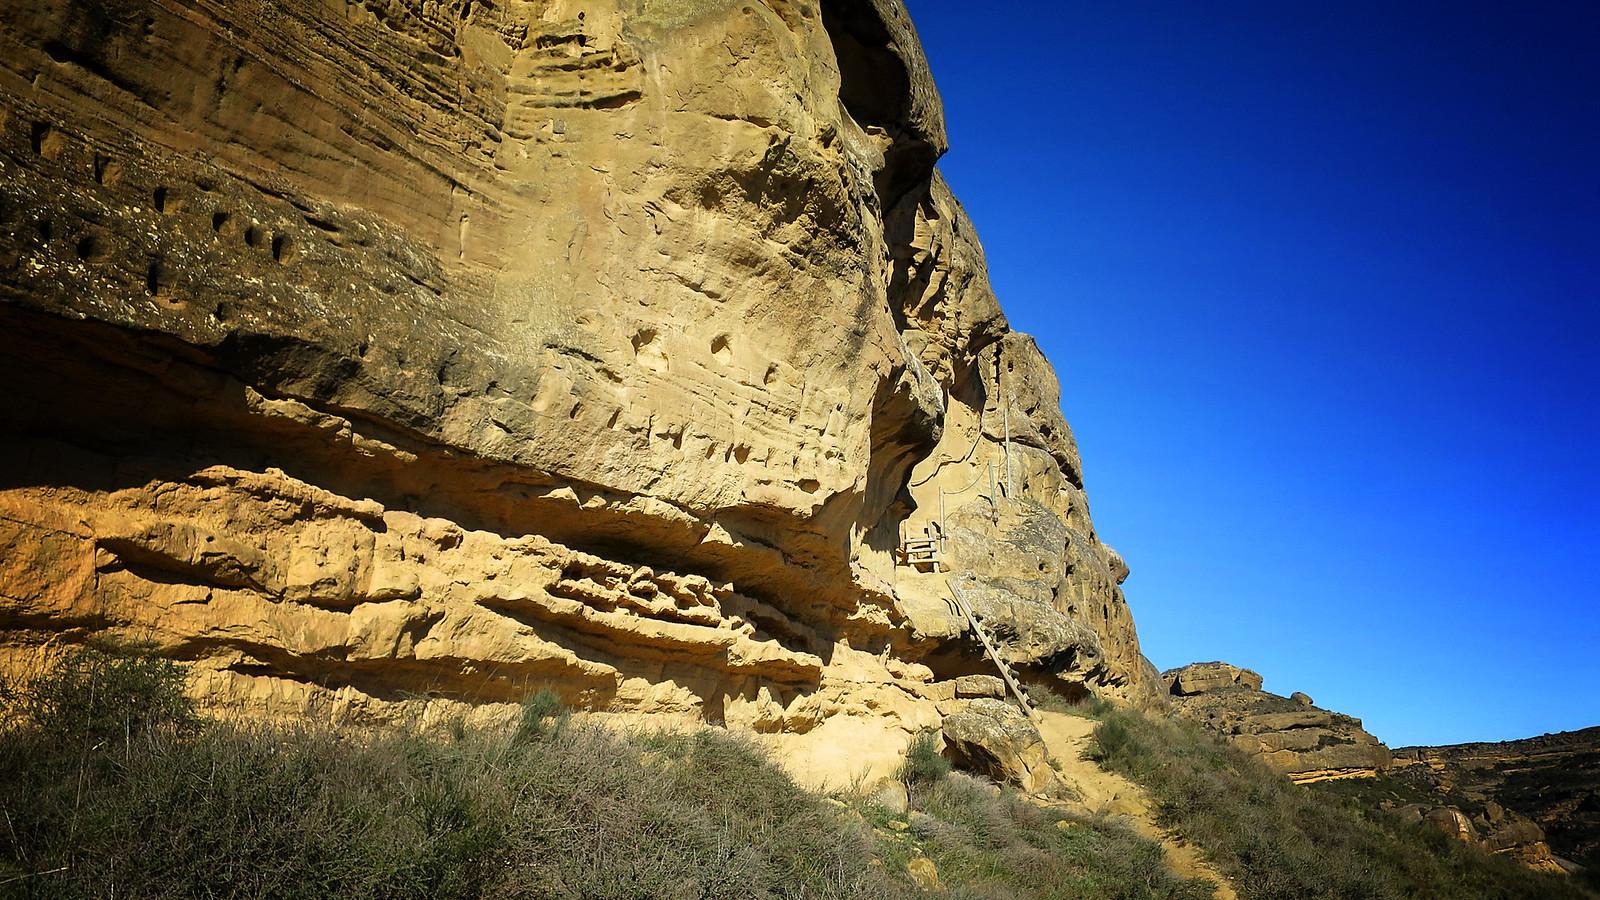 Las Escarpaduras de Piracés: Piracés - Piedra Mediodia - Arboles como arqueología - Calzada Romana